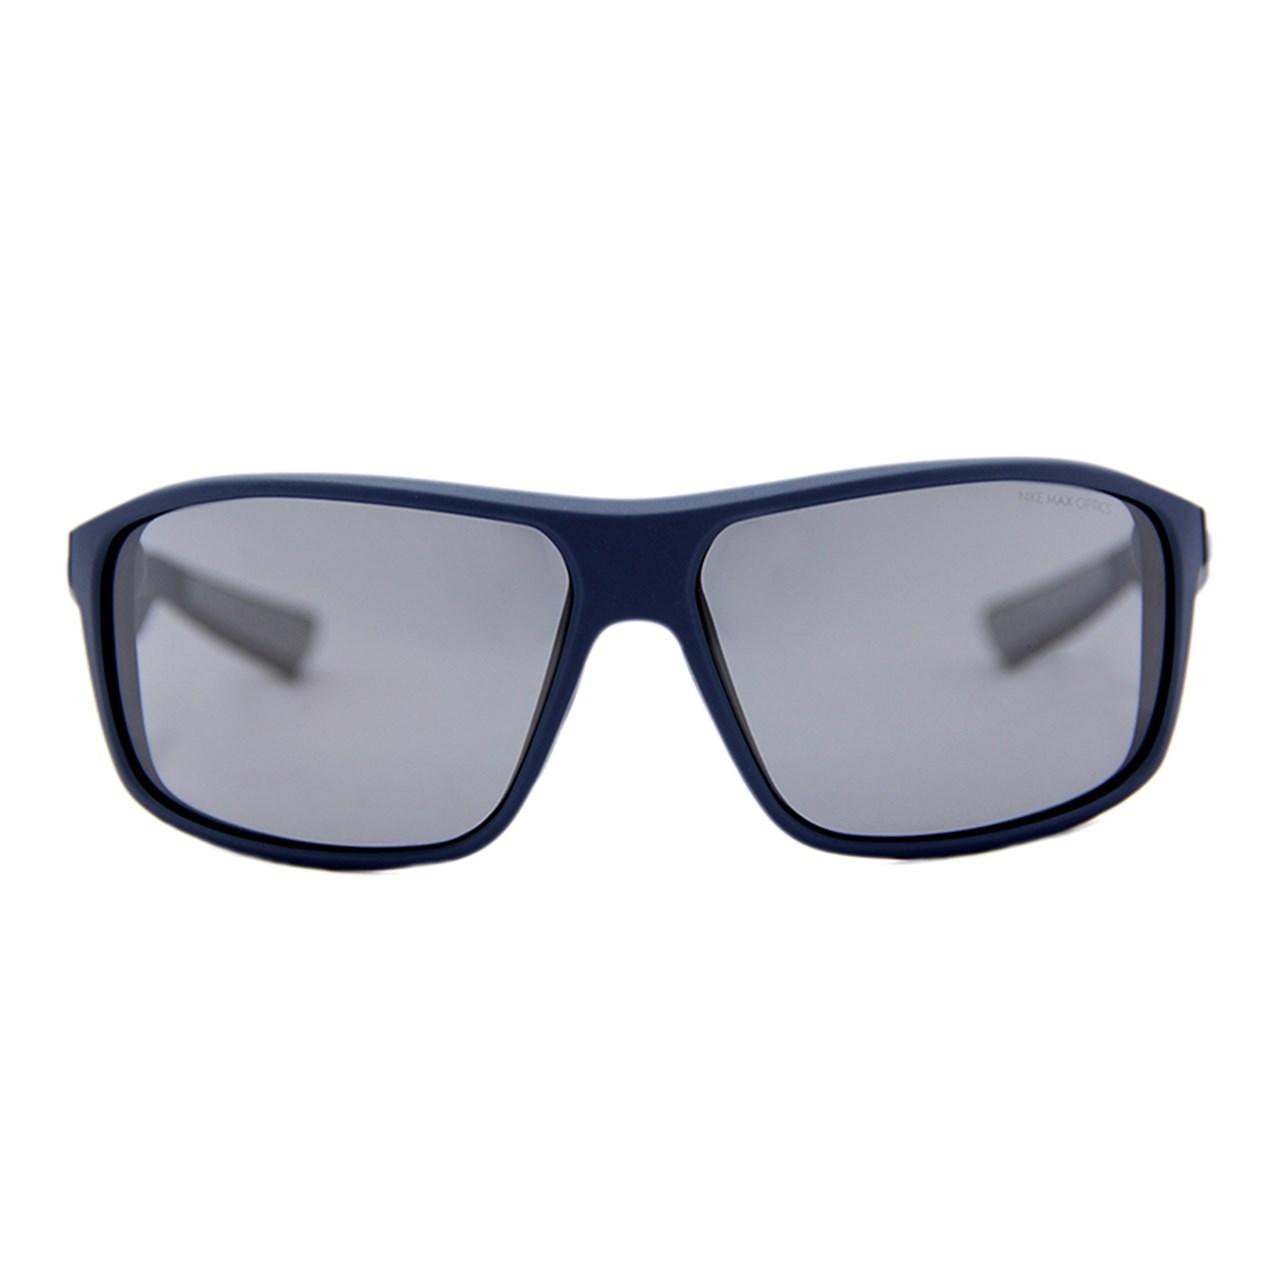 عینک آفتابی نایکی سریPREMIER  مدل 792 رنگ 402